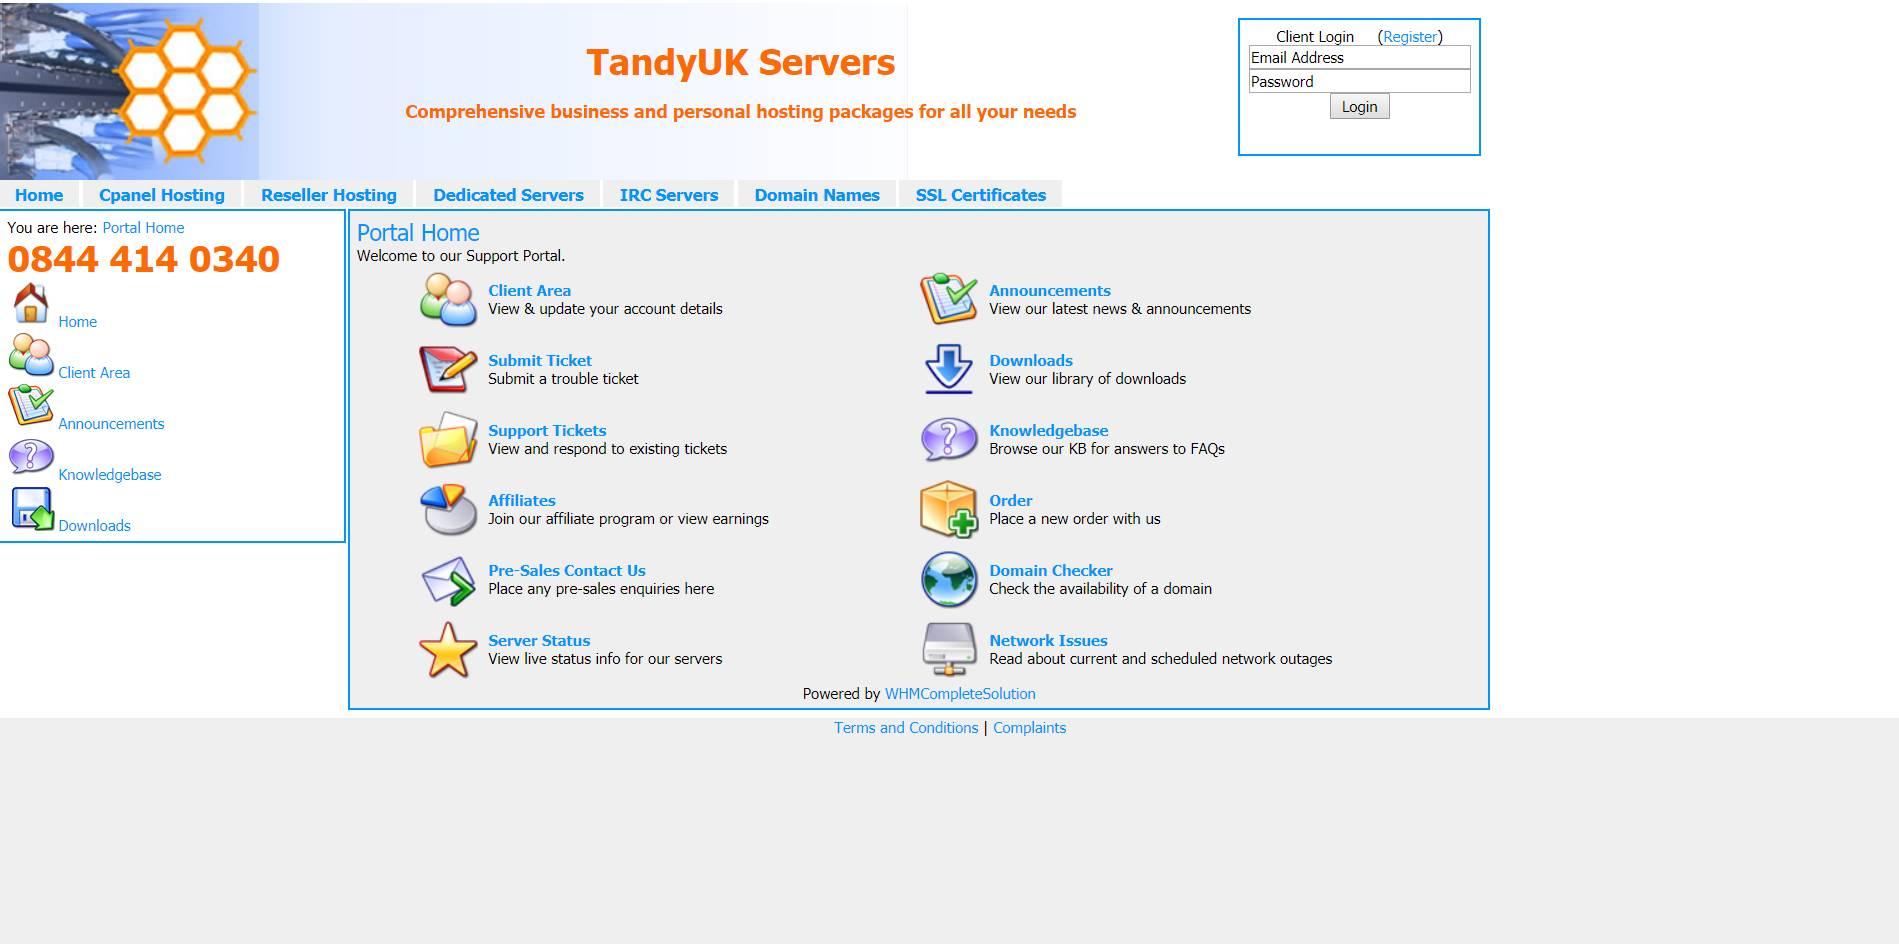 TandyUK Servers